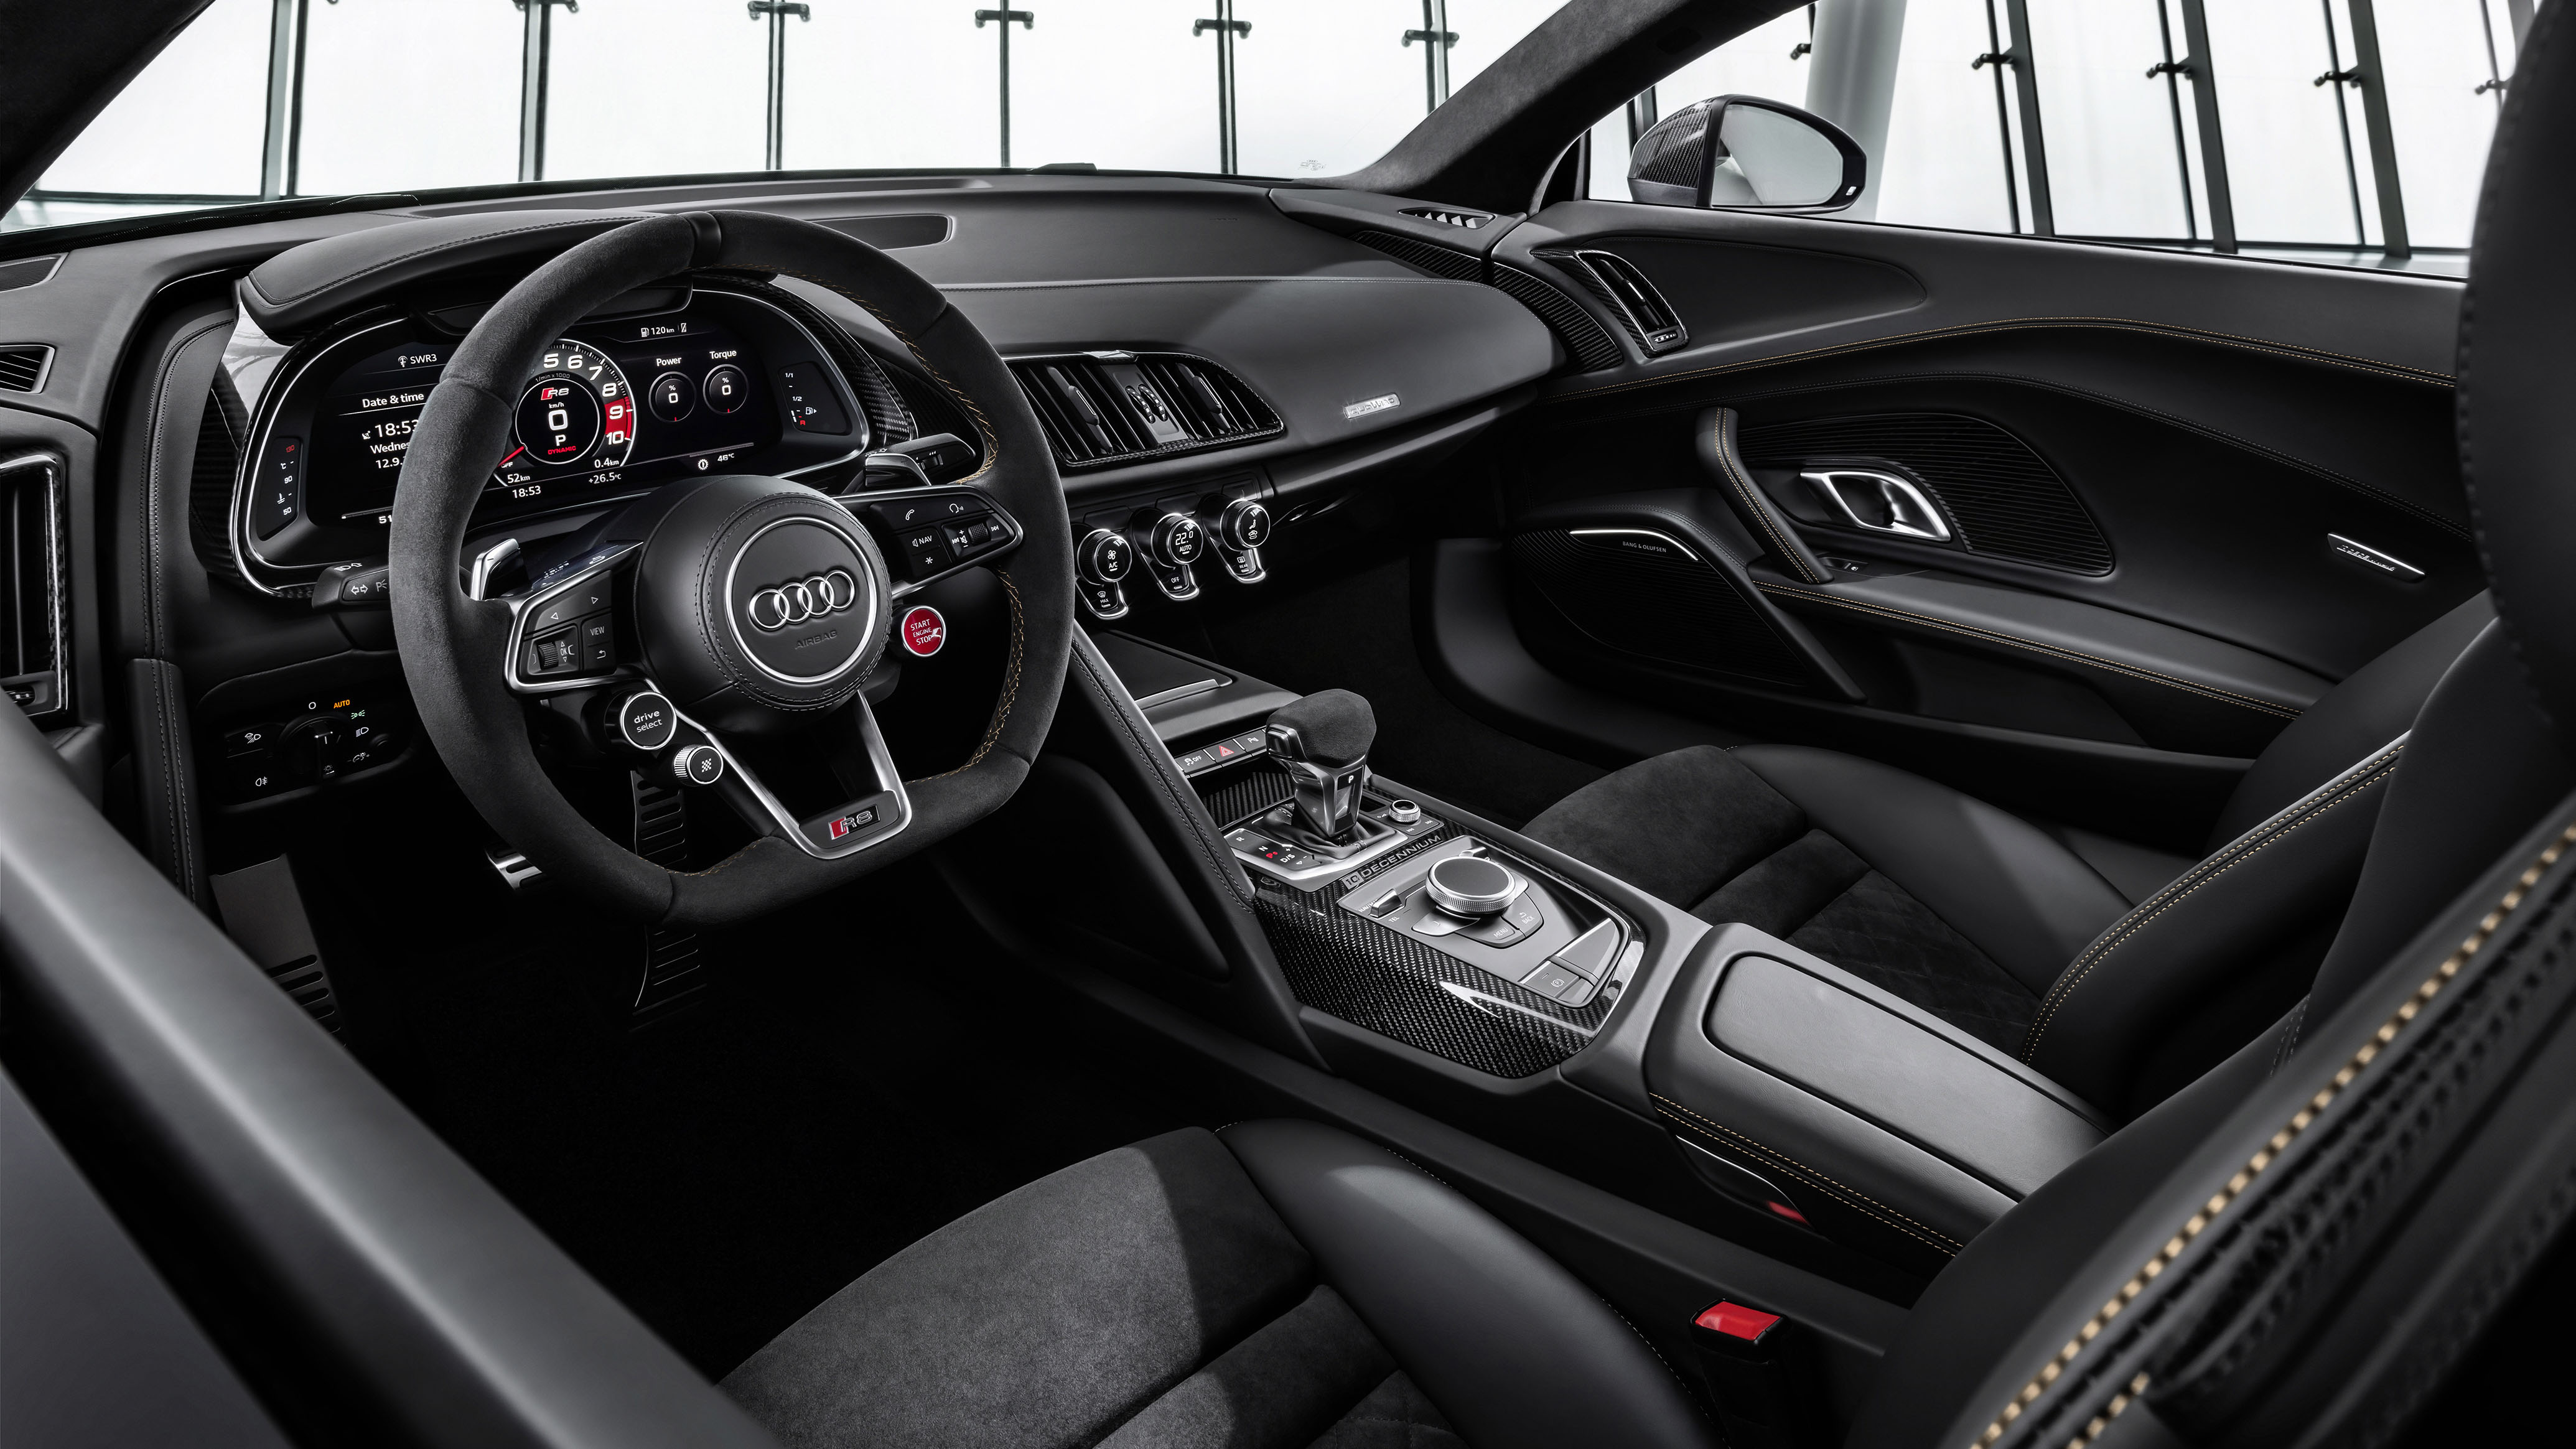 2019 Audi R8 V10 Decennium Revealed Not For Australia Caradvice